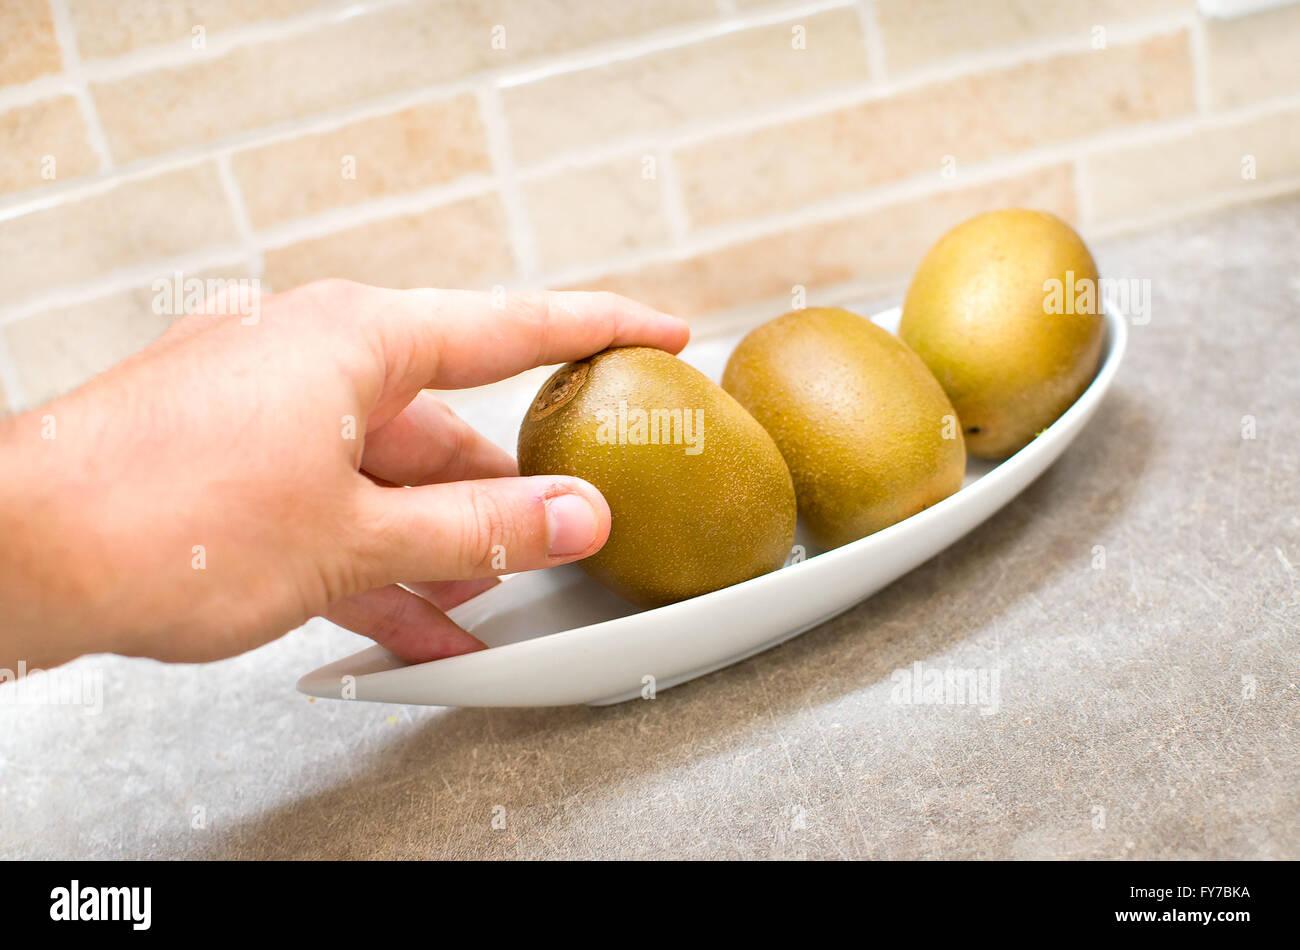 kiwi nutritional food - Stock Image